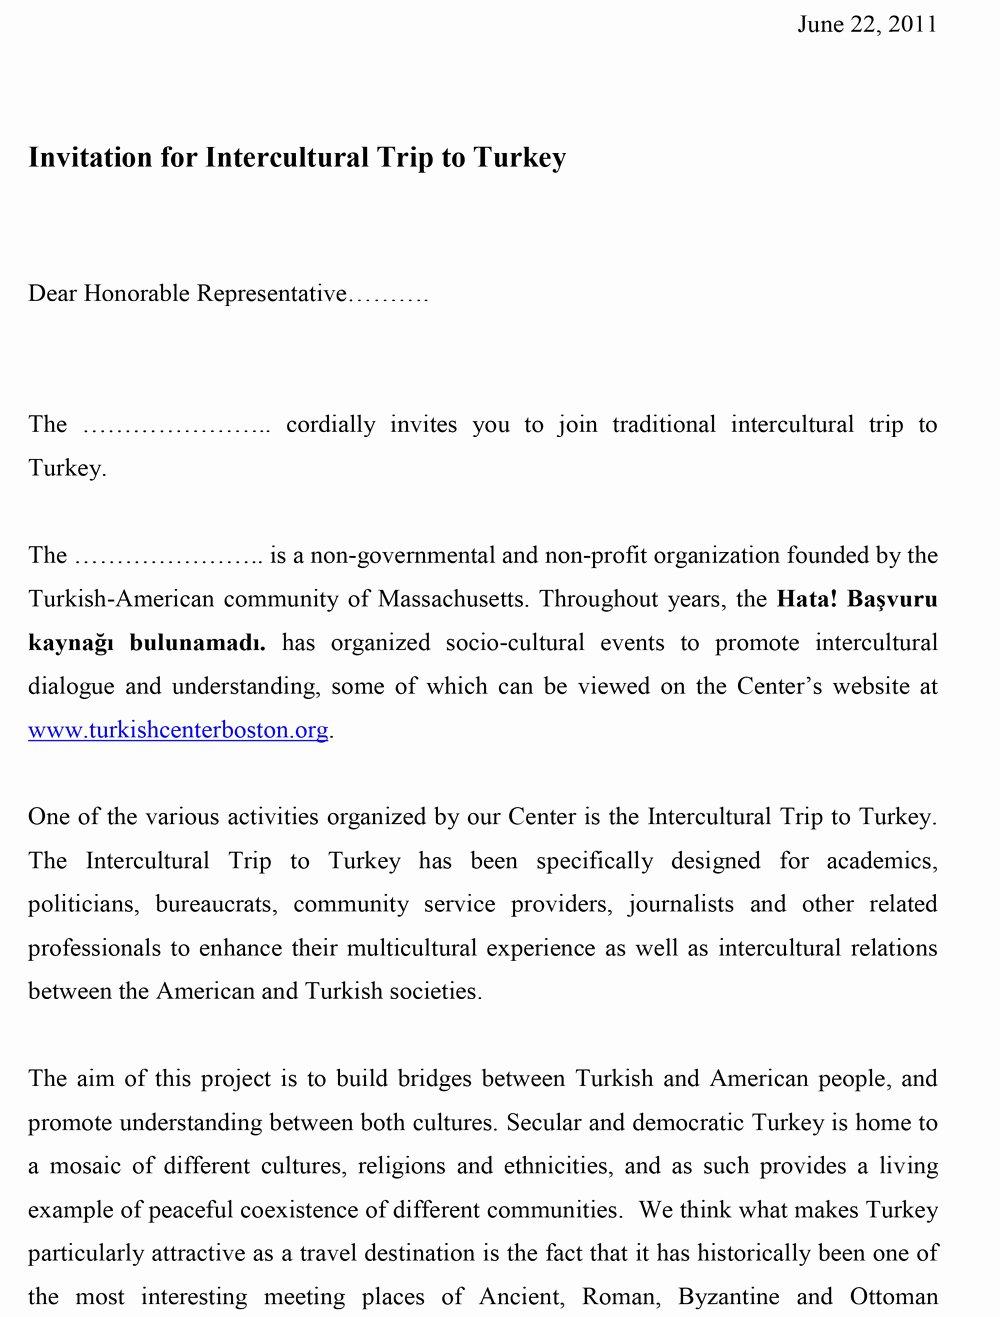 Samples Of Invitation Letters Fresh Sample Invitation Letter to Turkey Trip